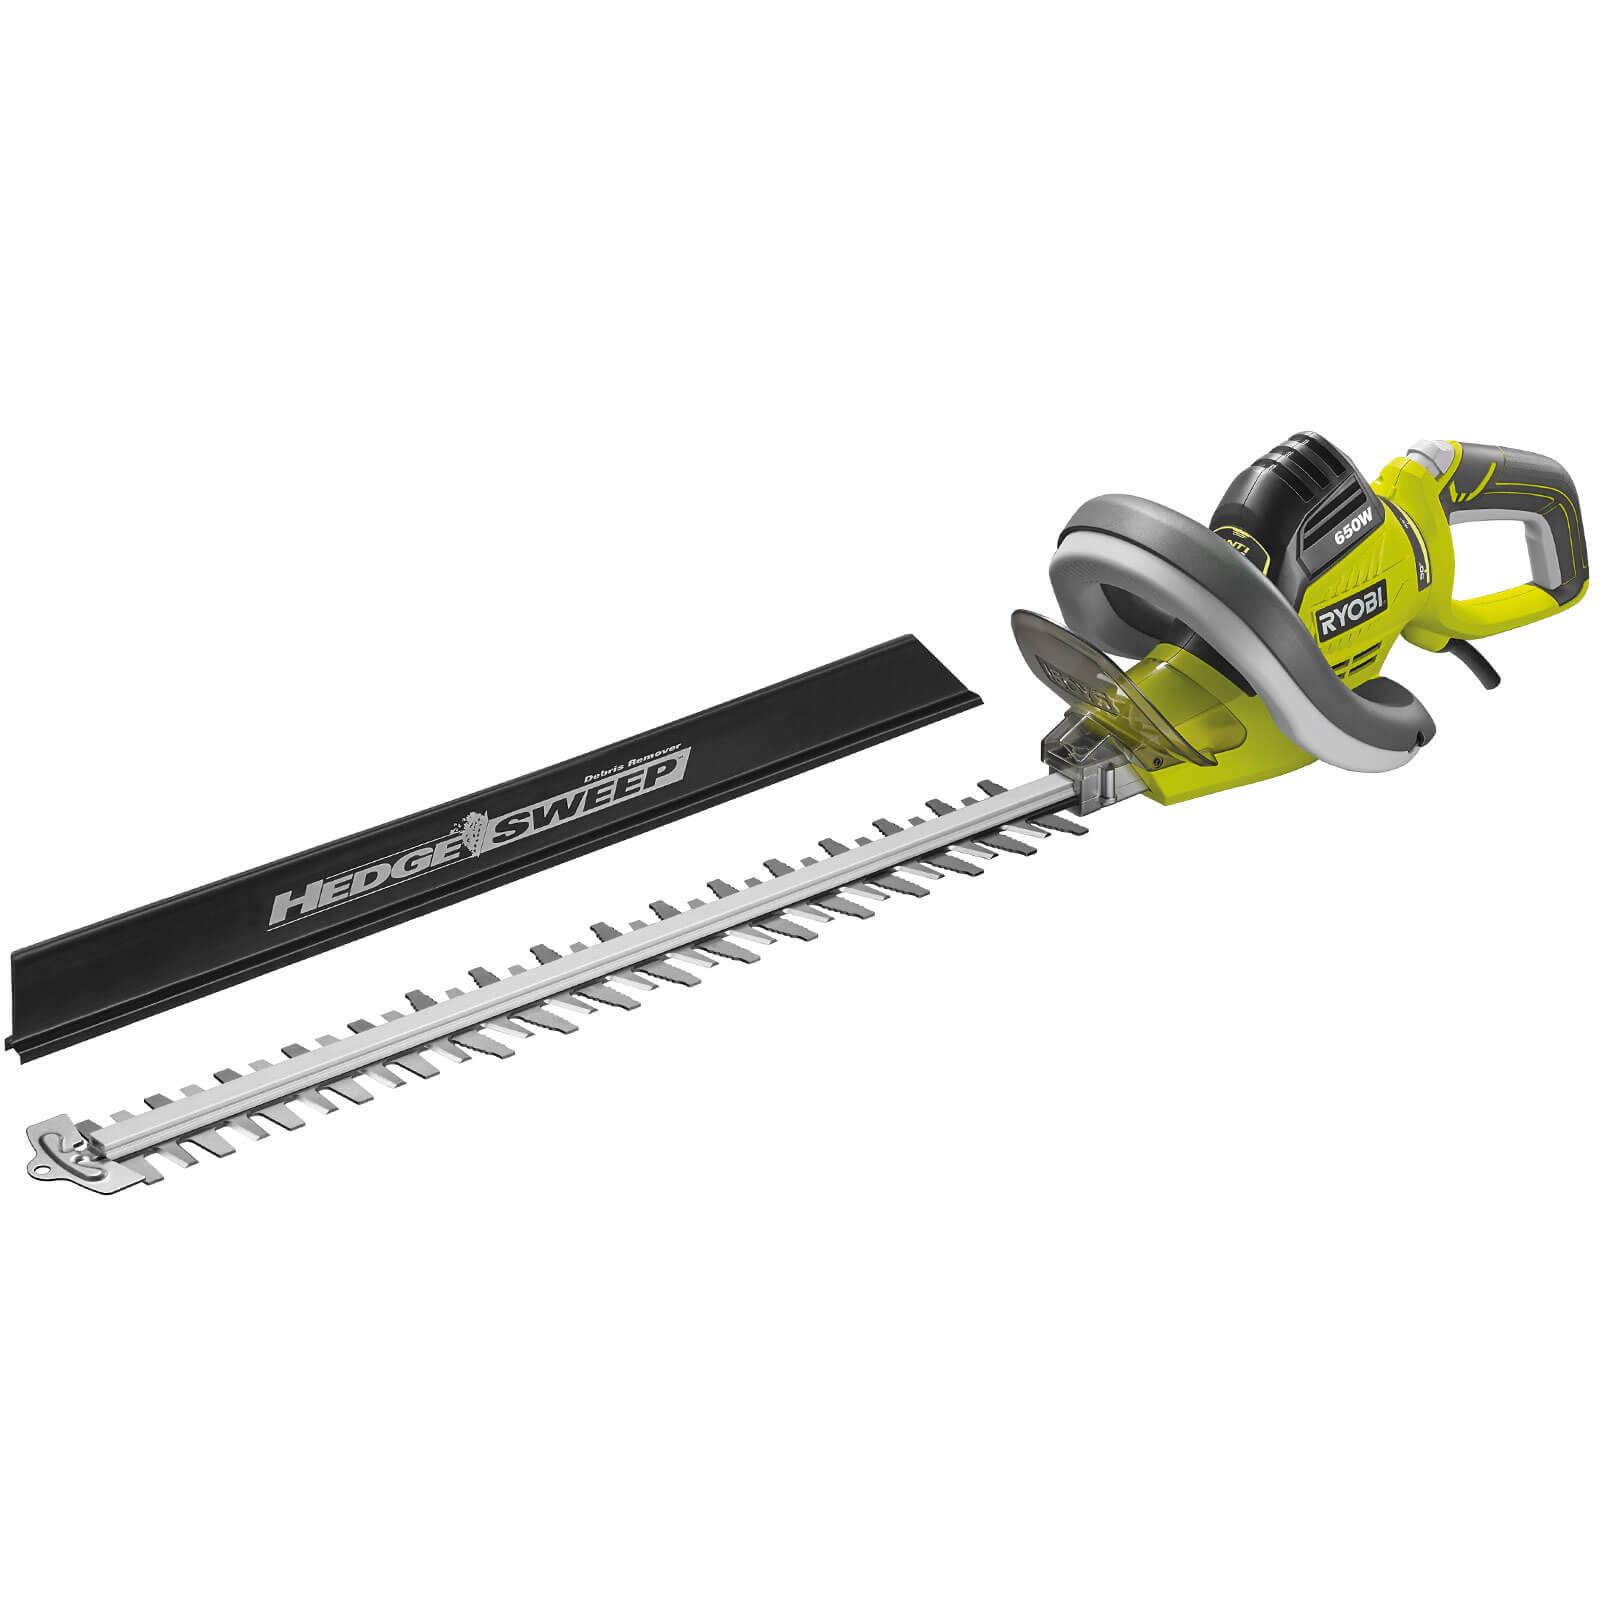 Ryobi RHT6560RL Electric Hedge Trimmer 600mm Blade Length 650w 240v